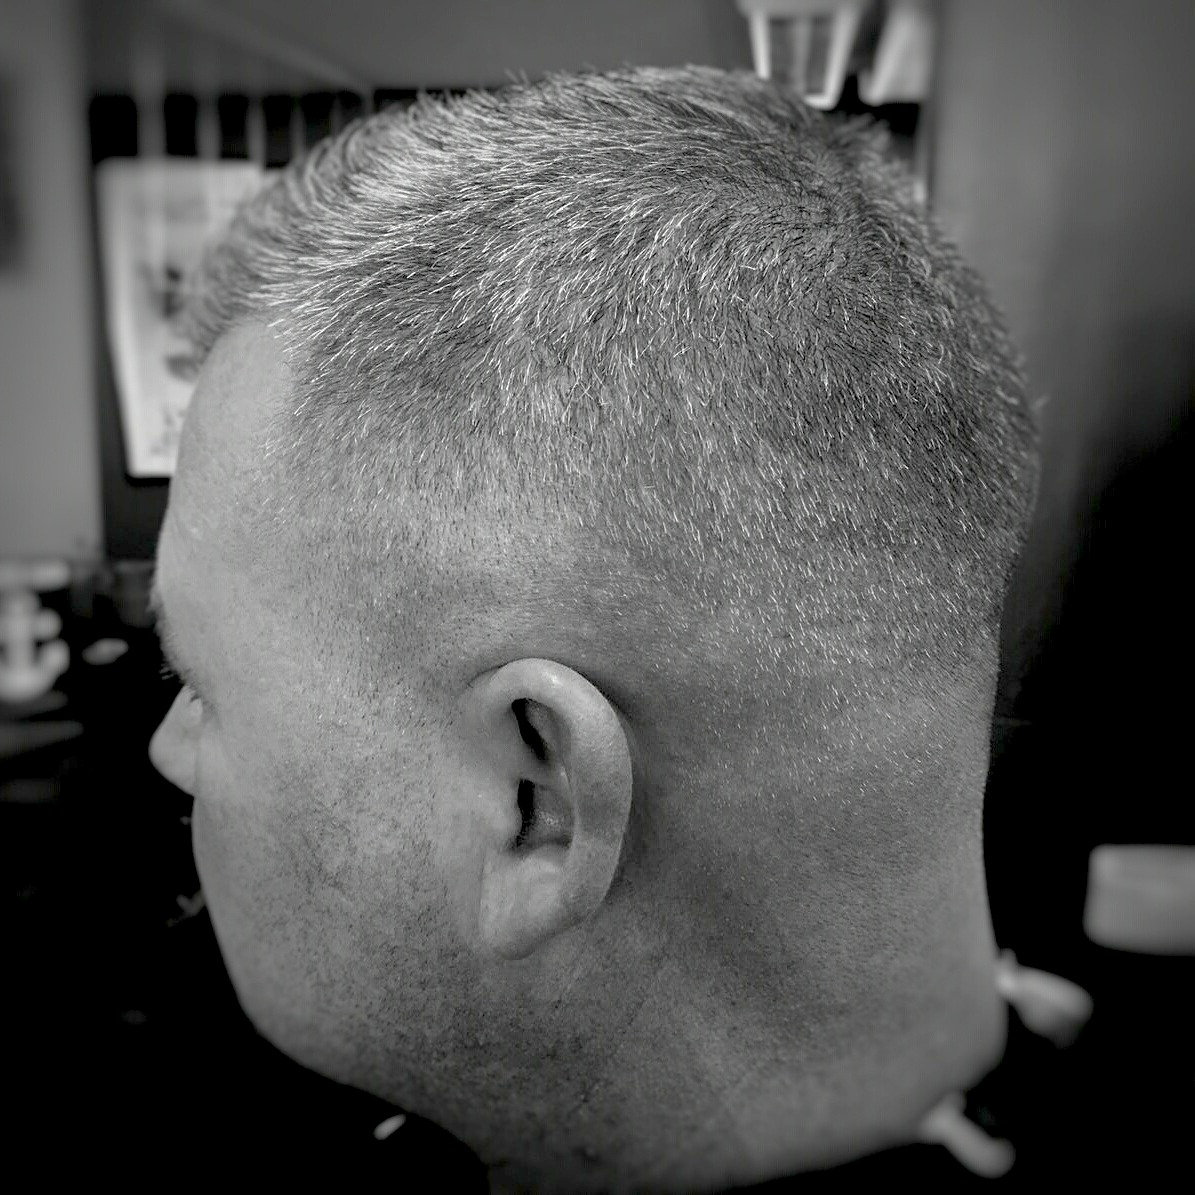 Skin Fade (Buzz Cut)